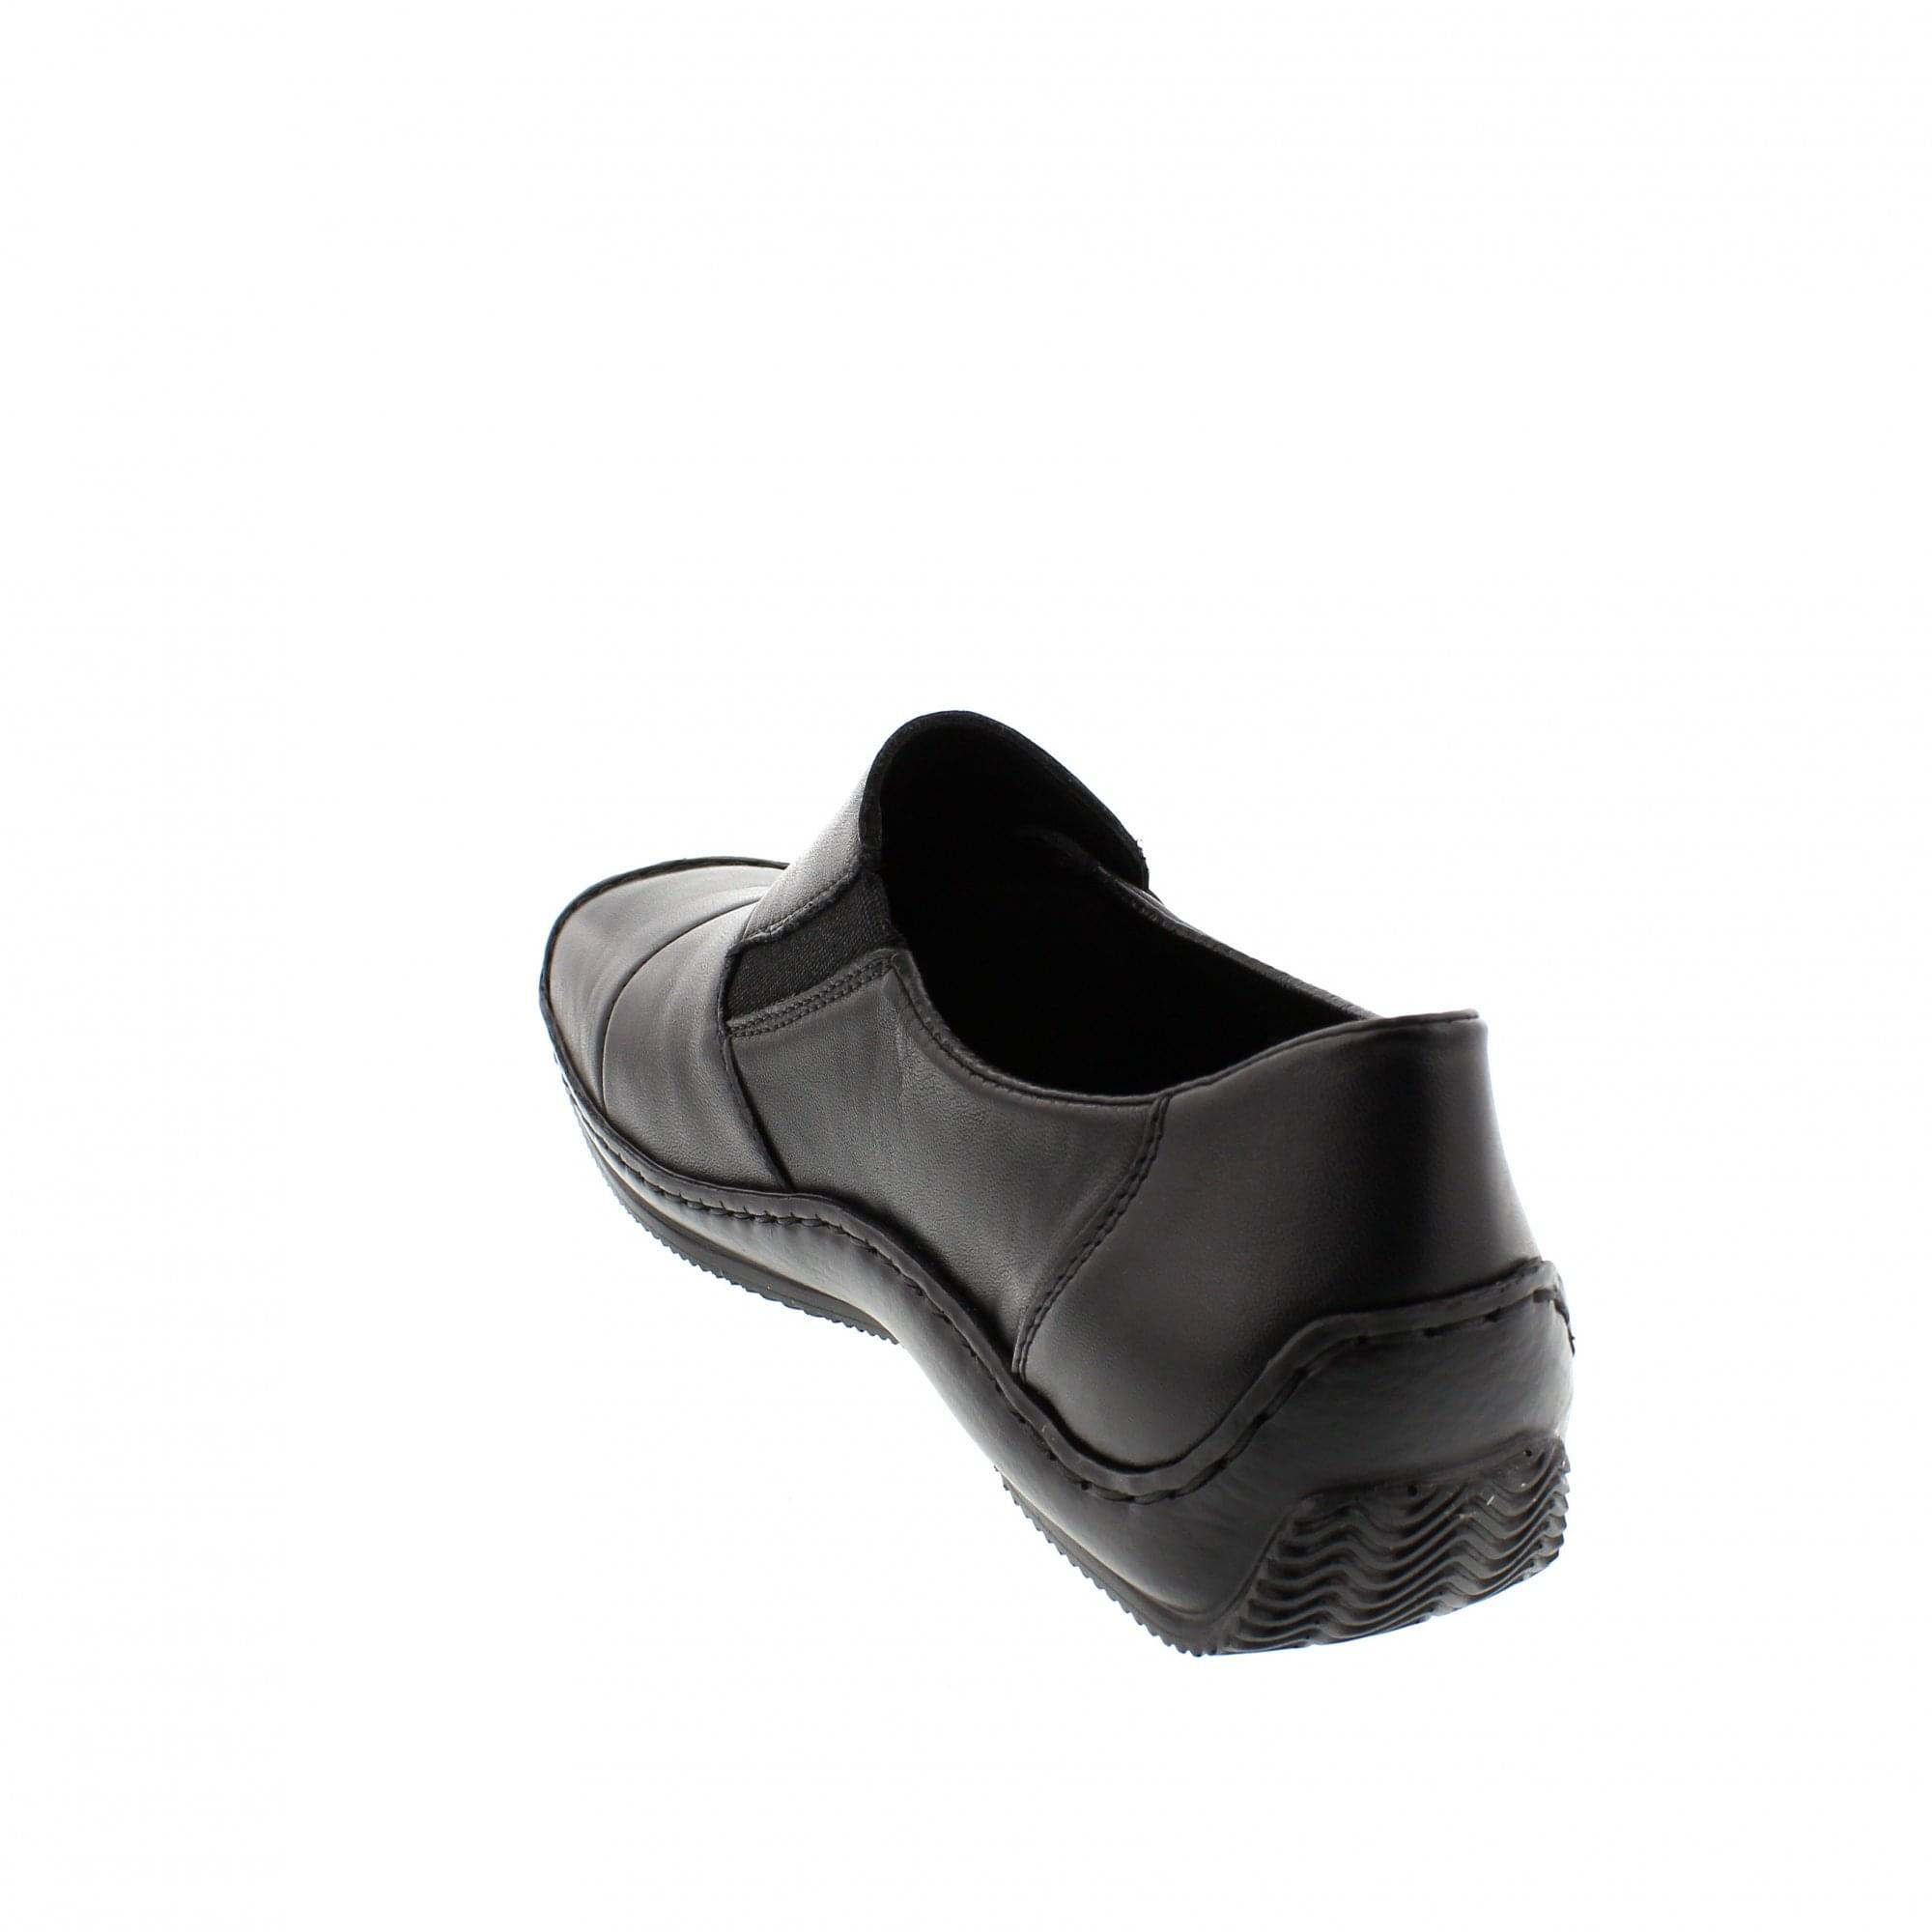 Rieker Damen L1762-00 Slipper